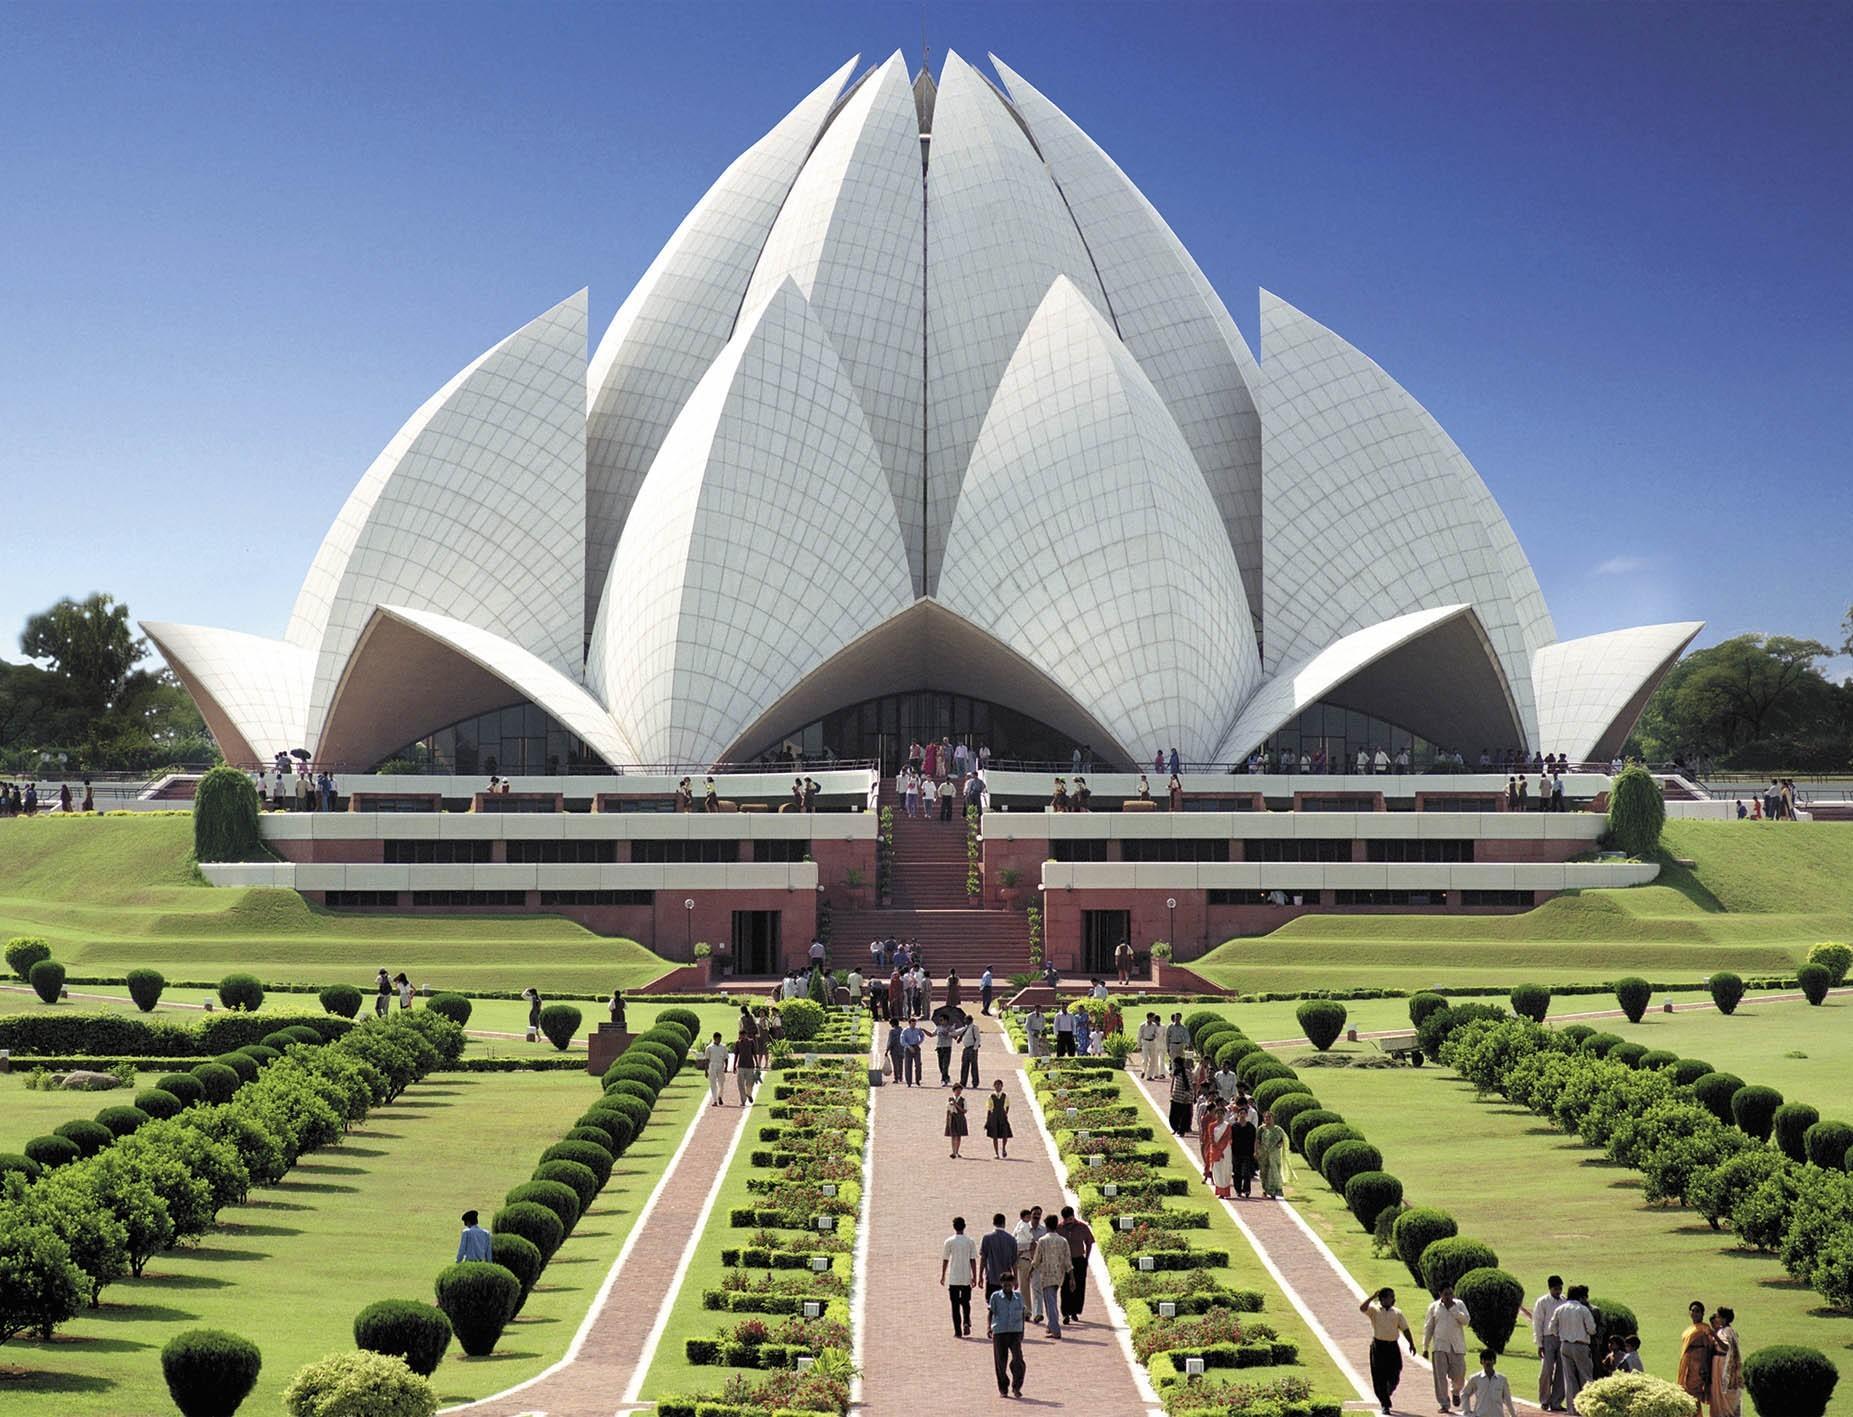 maravillas arquitectonicas 4